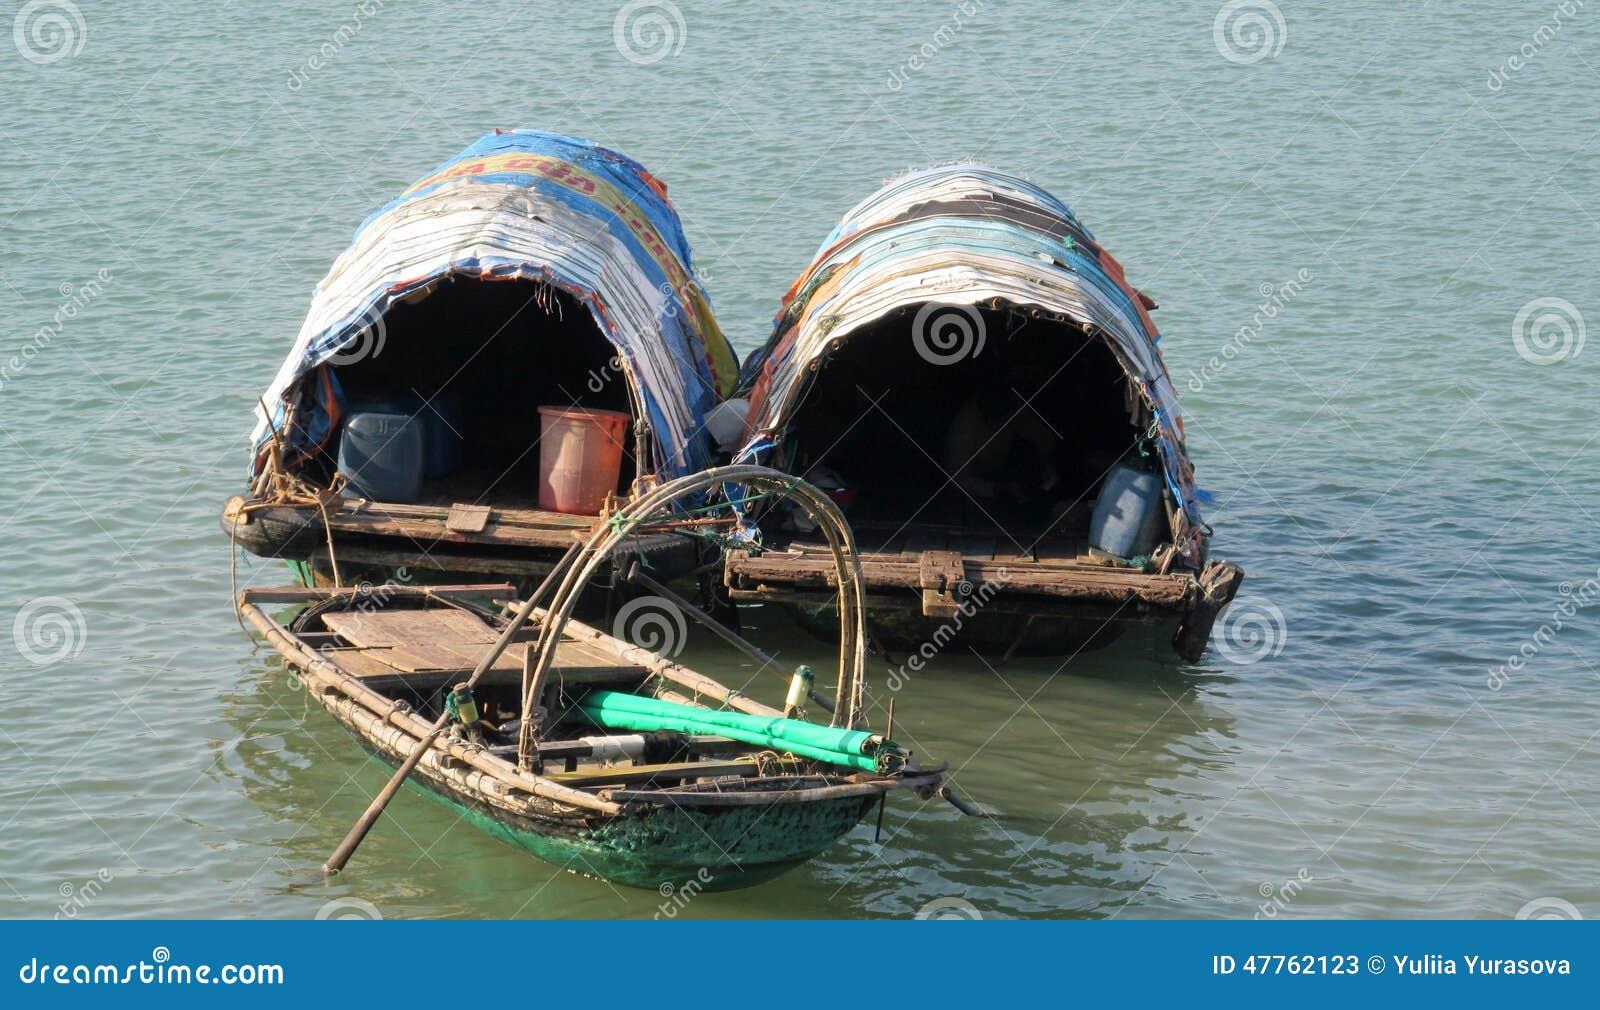 House boat in ha long bay near cat ba island vietnam for Floating fishing platform